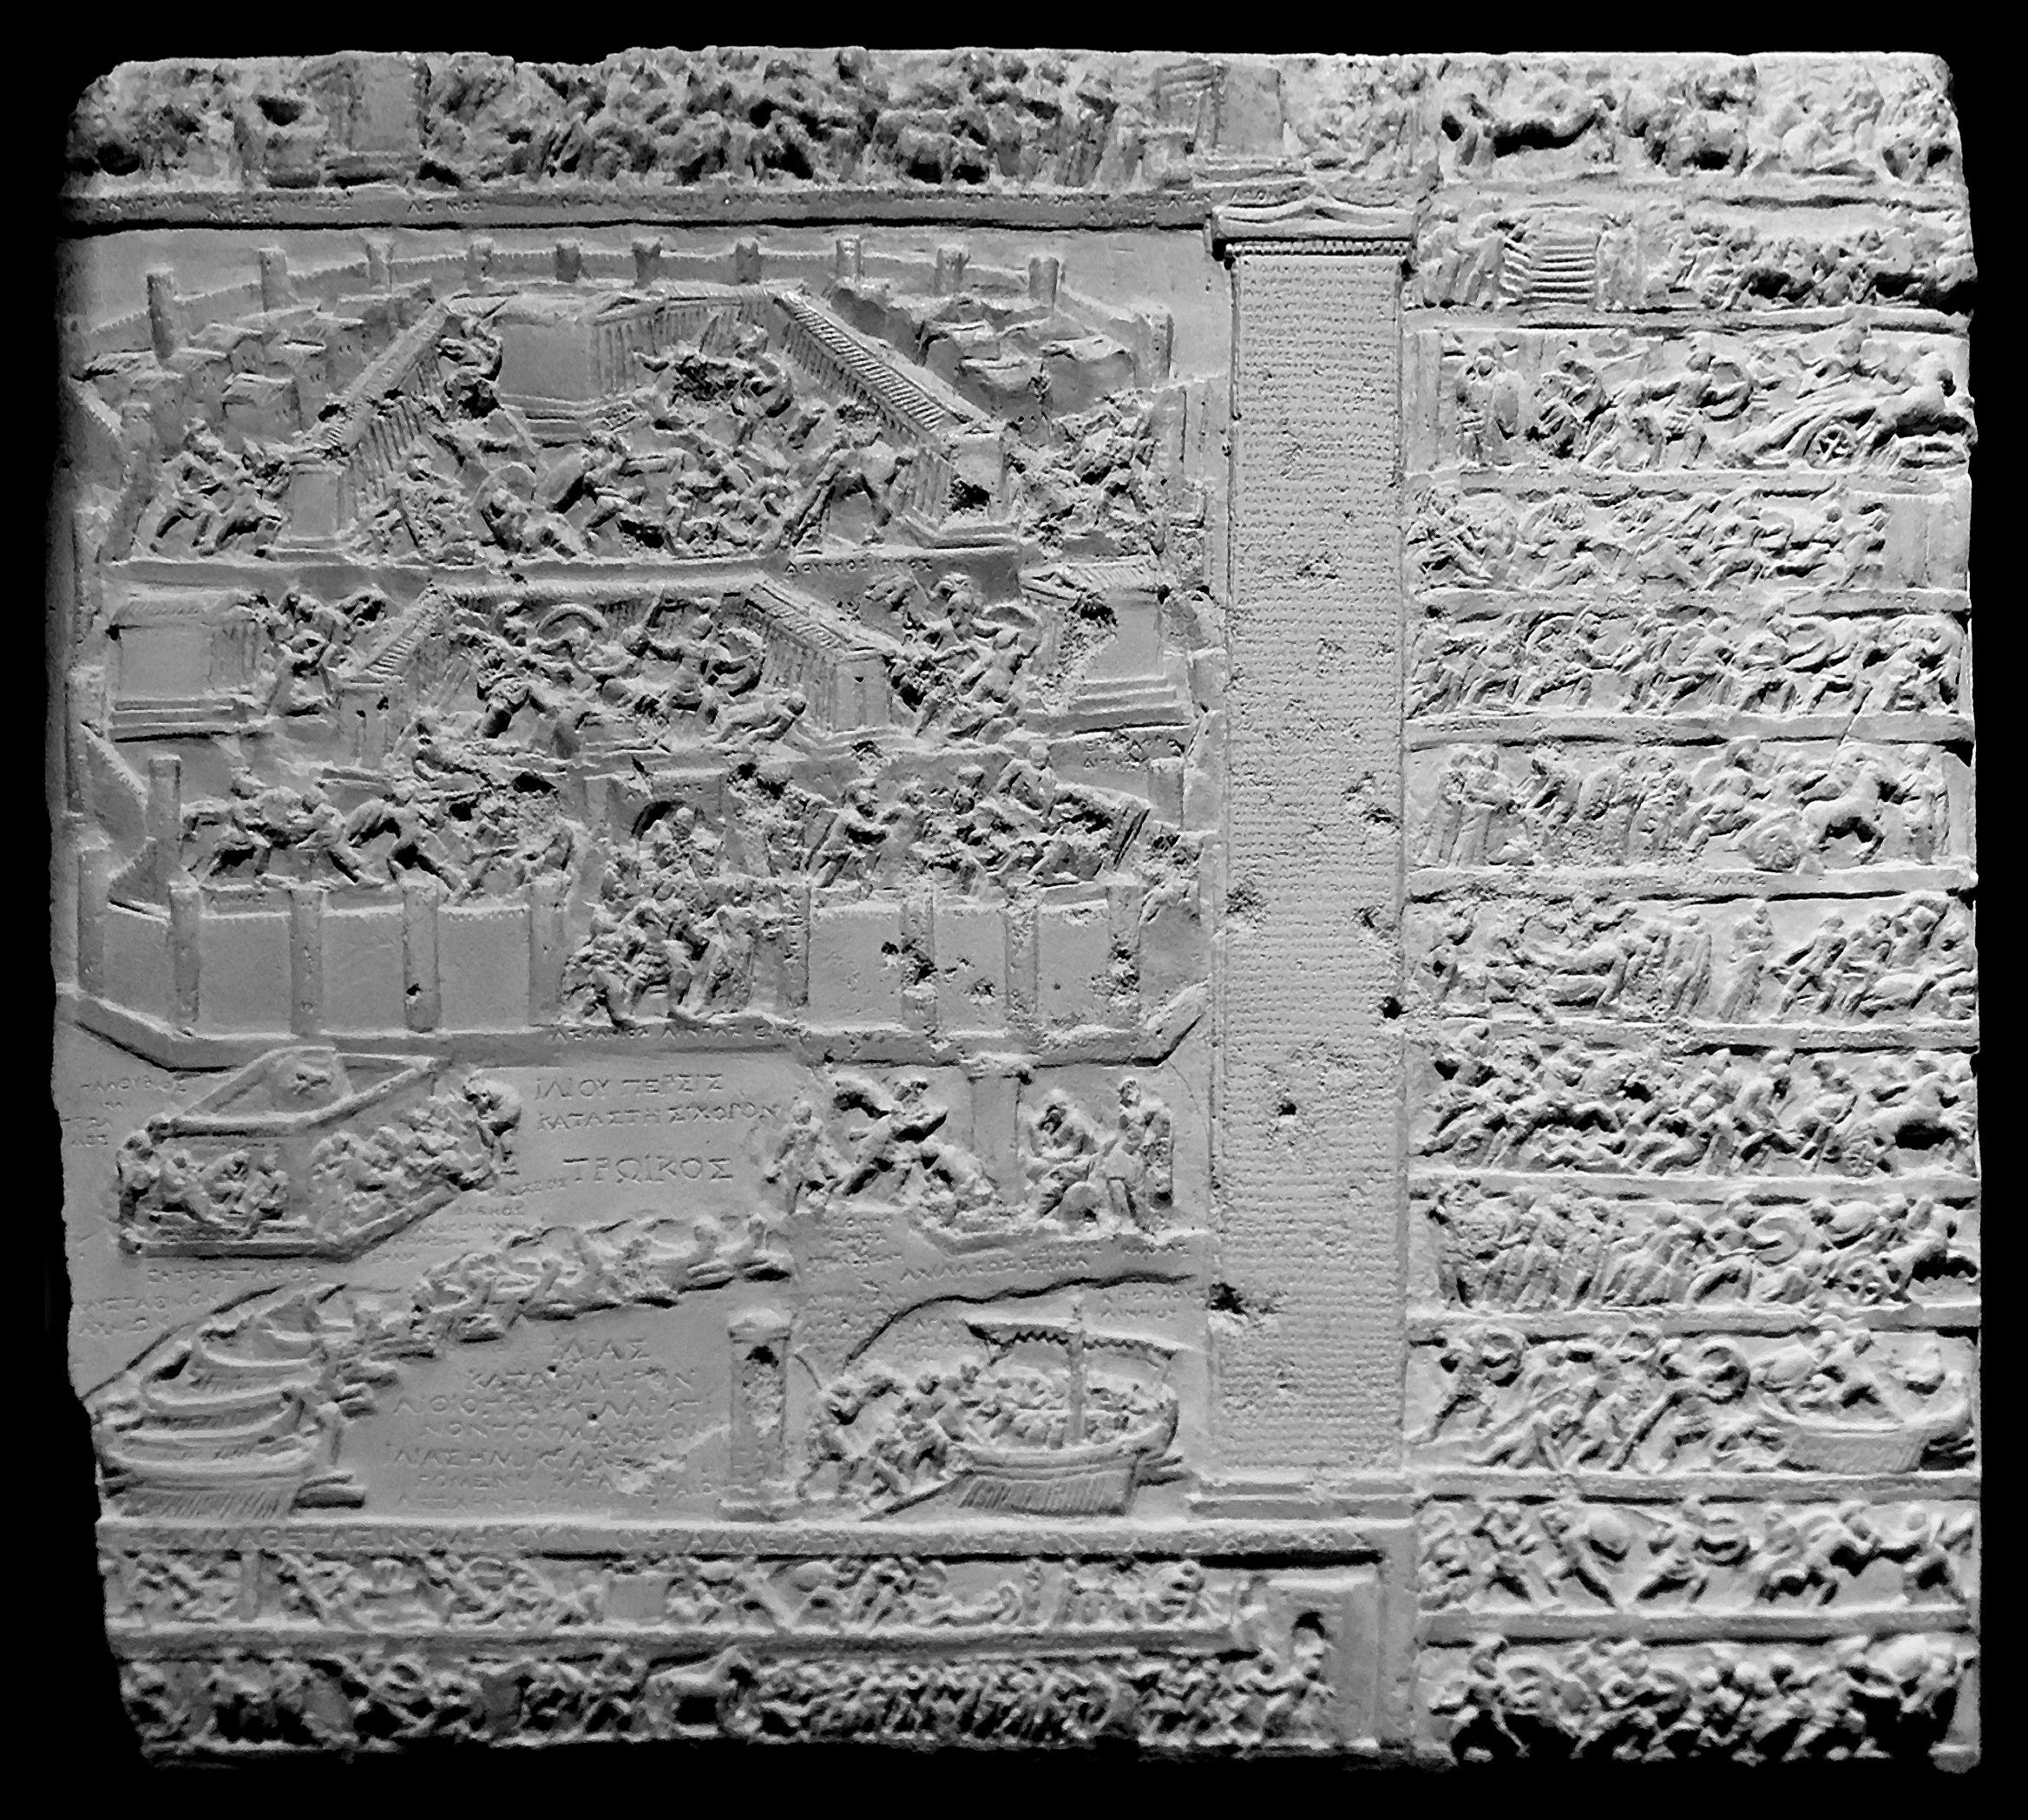 "1. Jh. v./n. Chr. Marmor, Höhe 25 cm. Rom, Musei Capitolini Inv. 316.<br>Quelle: <a href=""https://commons.wikimedia.org/wiki/File:Tabula_iliaca_Musei_Capitolini_MC0316_retouched.jpg "">User:Jastrow / Wikimedia Commons</a><br> Lizenz: Public Domain"